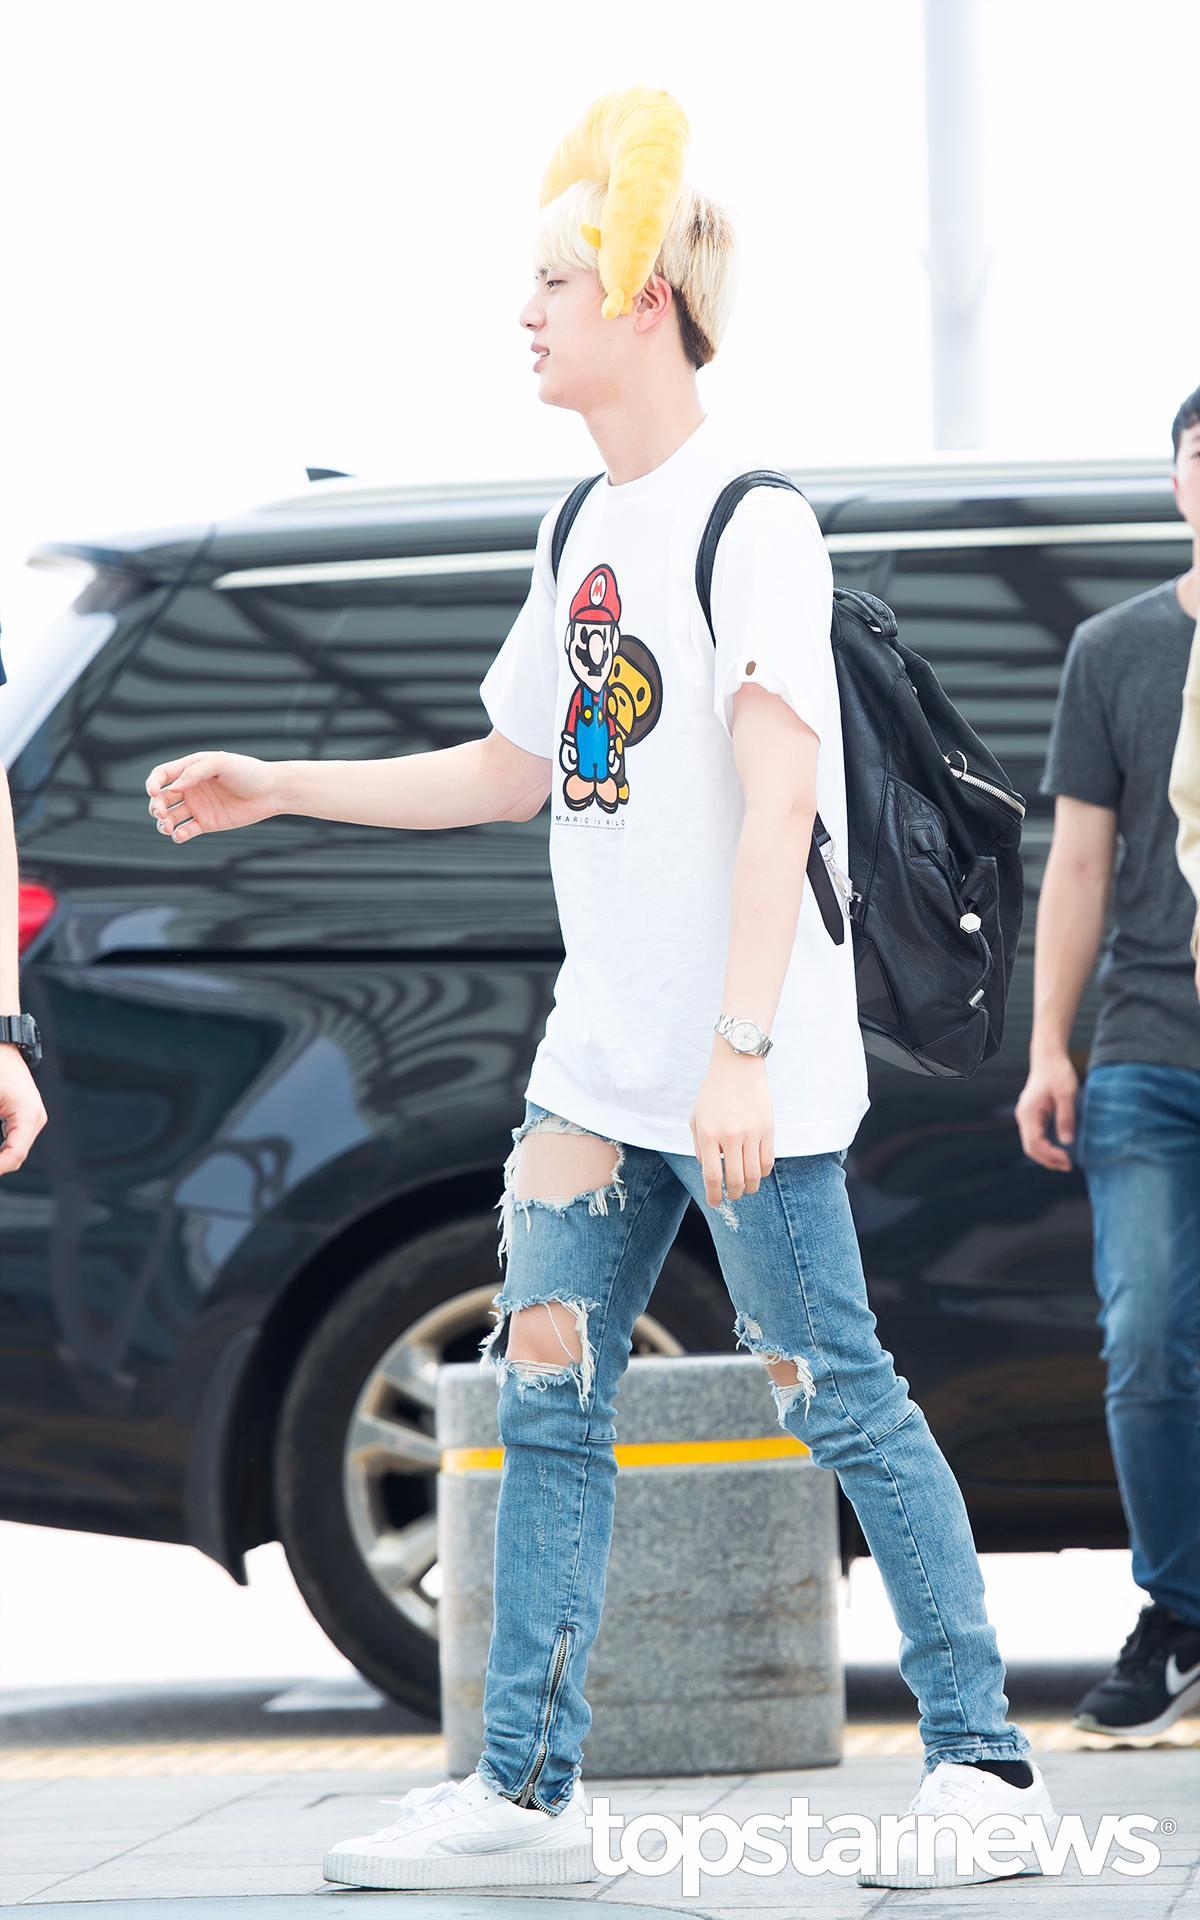 Jin啊~你這樣把機場當自己家,放這麼開沒問題嗎?(是太陽太大所以讓你眼睛變小了嗎?)